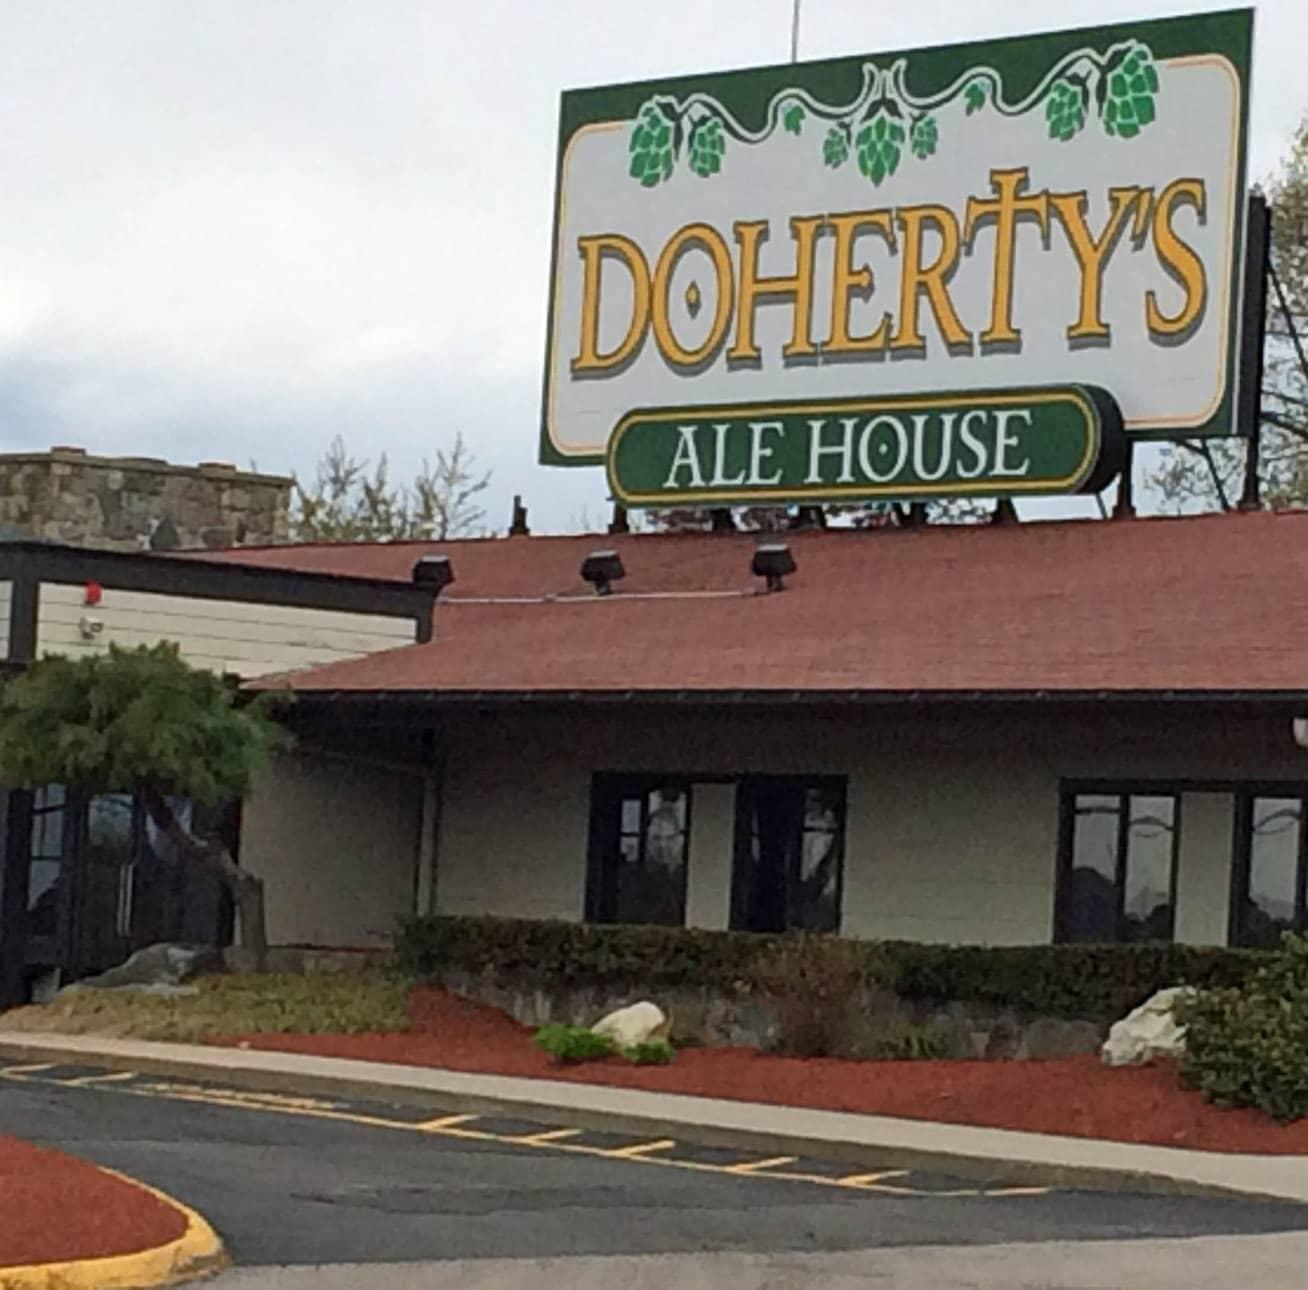 [CREDIT: Rob Borkowski] Doherty's Ale House at 33 Jefferson Blvd.